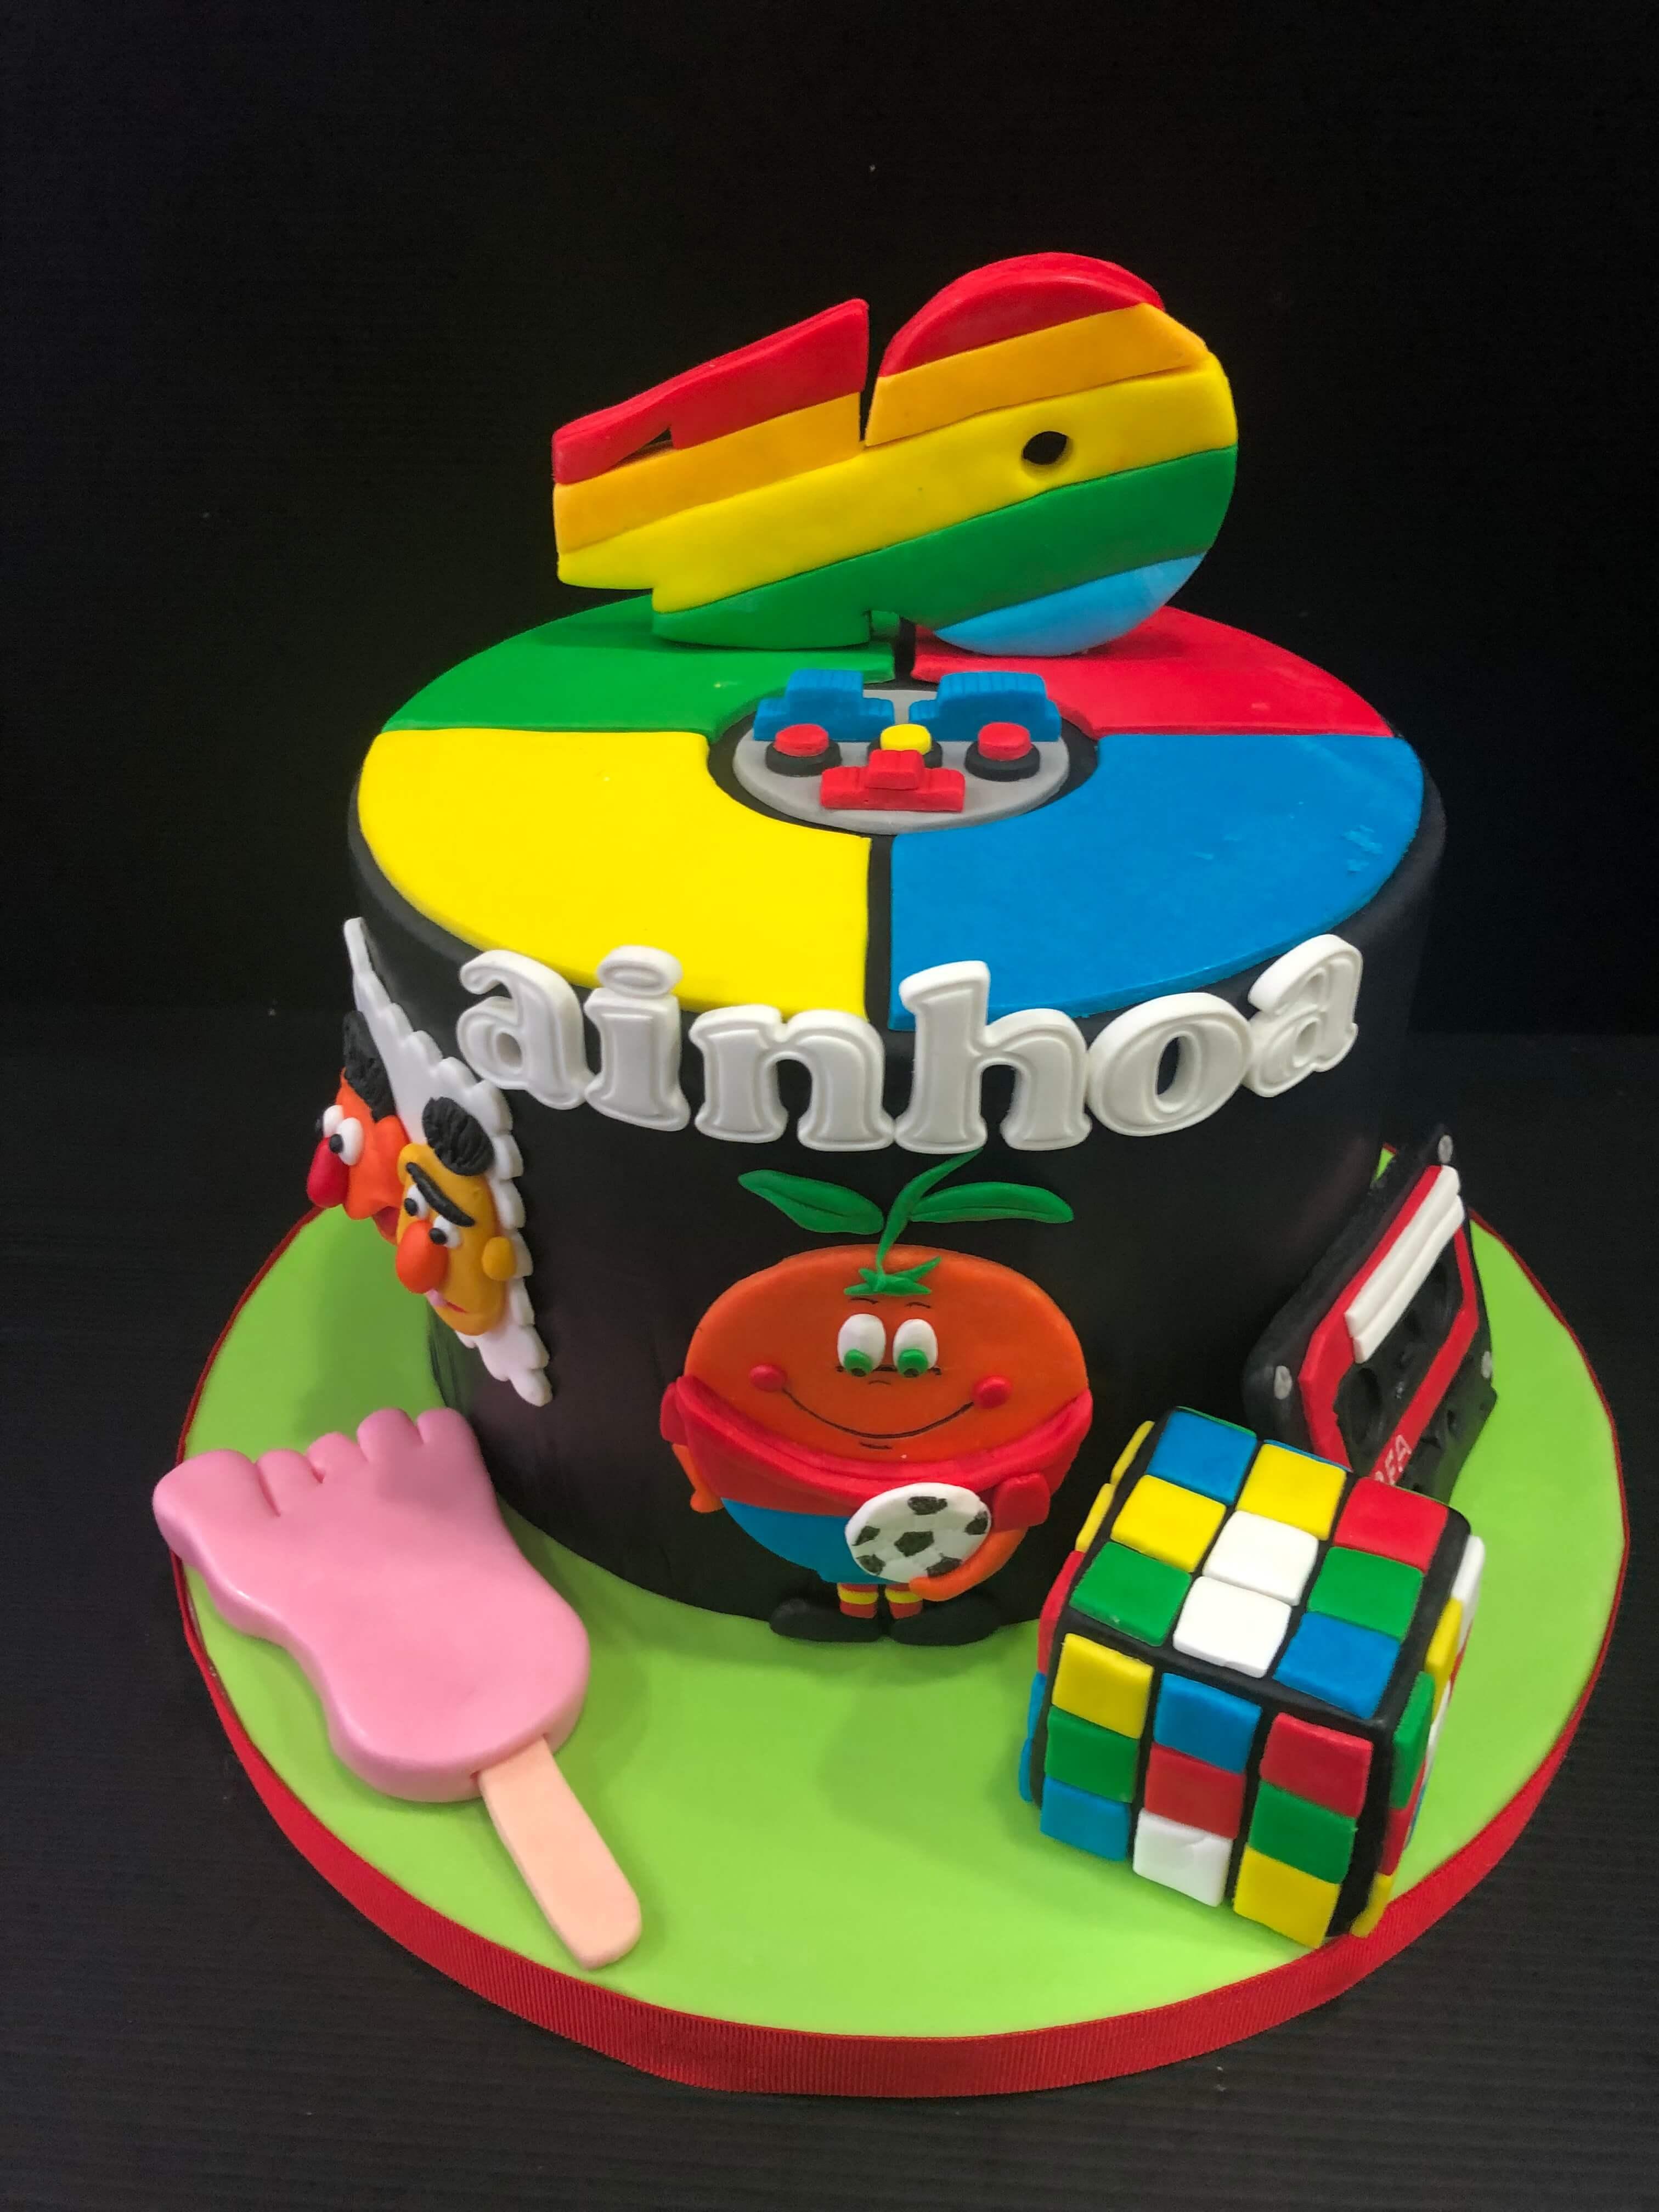 tarta cumpleaños original 80´s personalizada coruña simón frio pie naranjito cubo Rubik  coruña